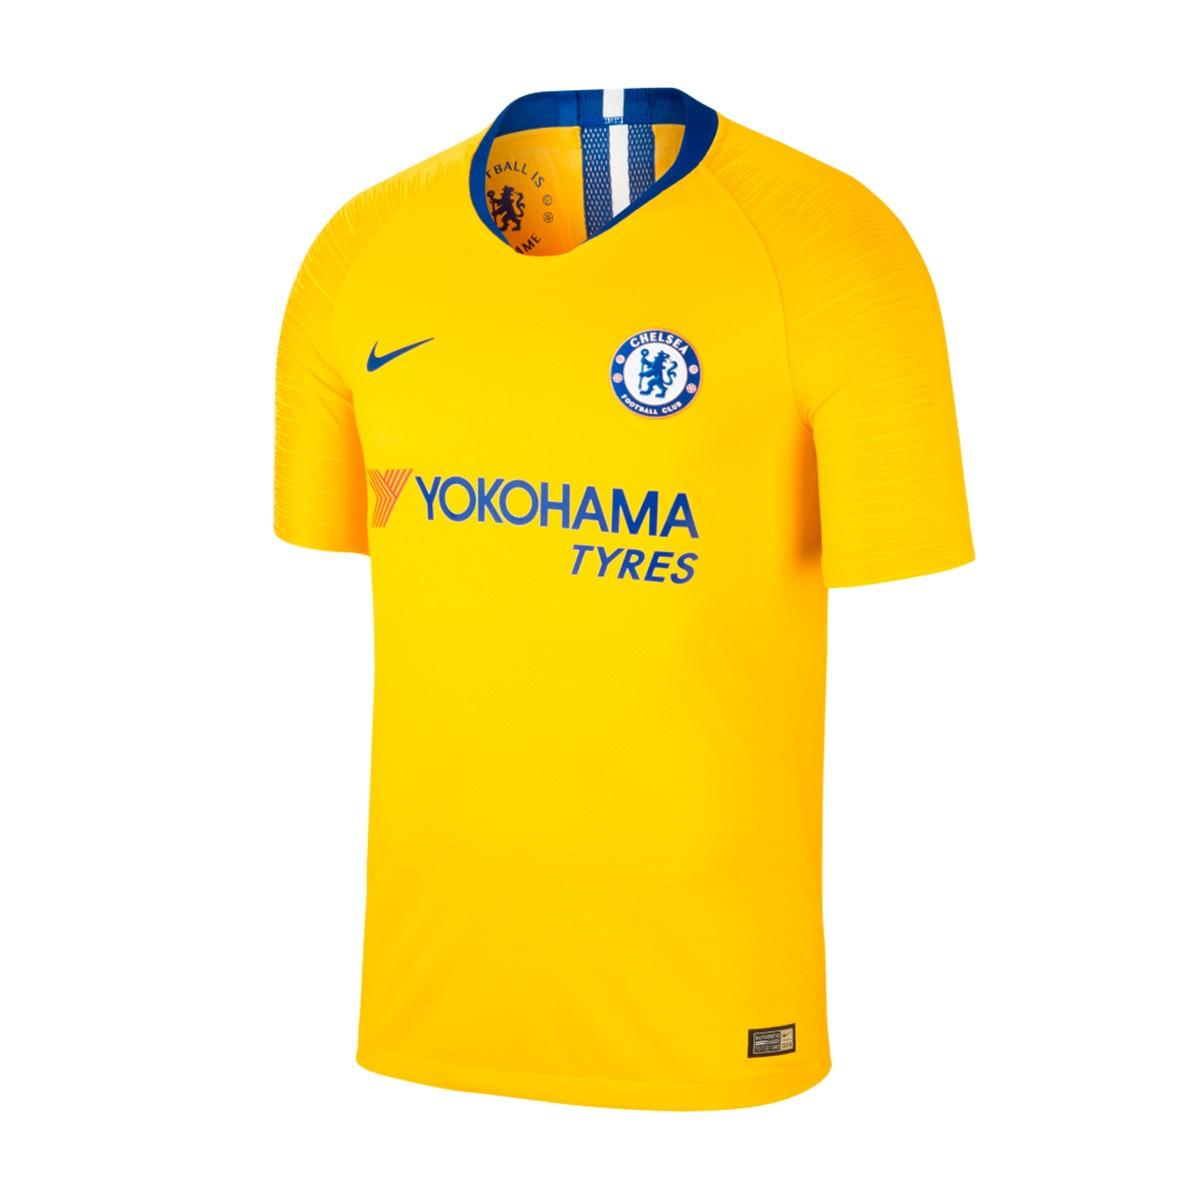 9ea1b2f23 Jersey Nike Vapor Chelsea FC 2018-2019 Away Tour yellow-Rush blue ...